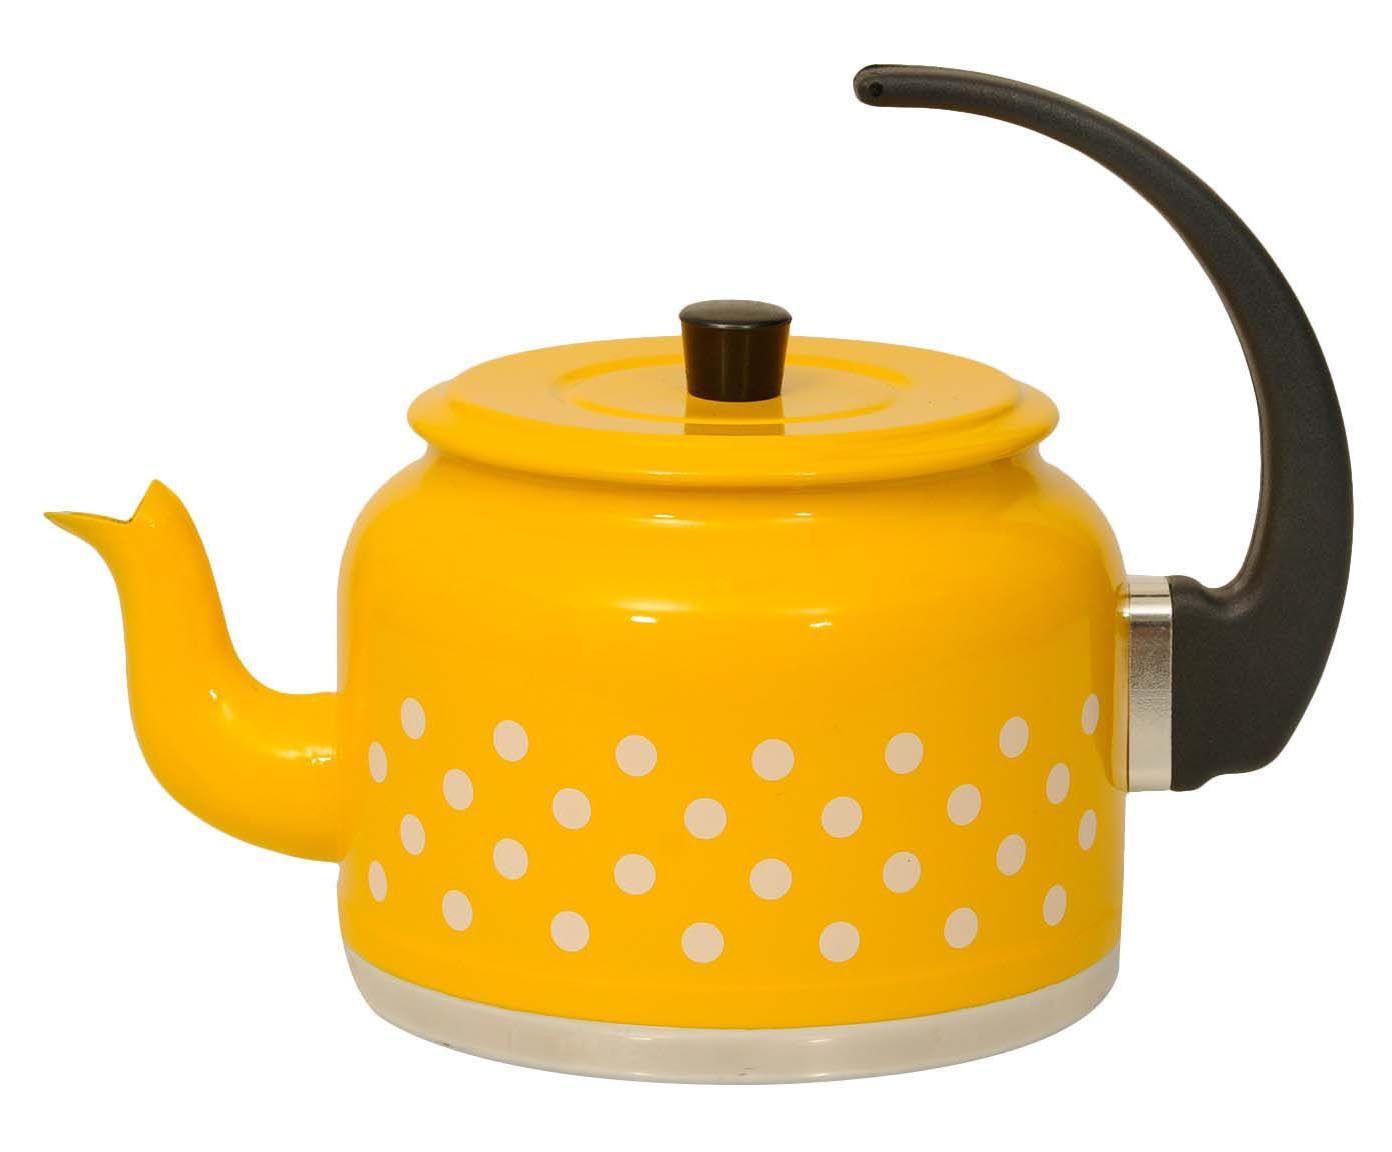 Chaleira Polka Dots Amarela e Branca - 1,5L | Westwing.com.br